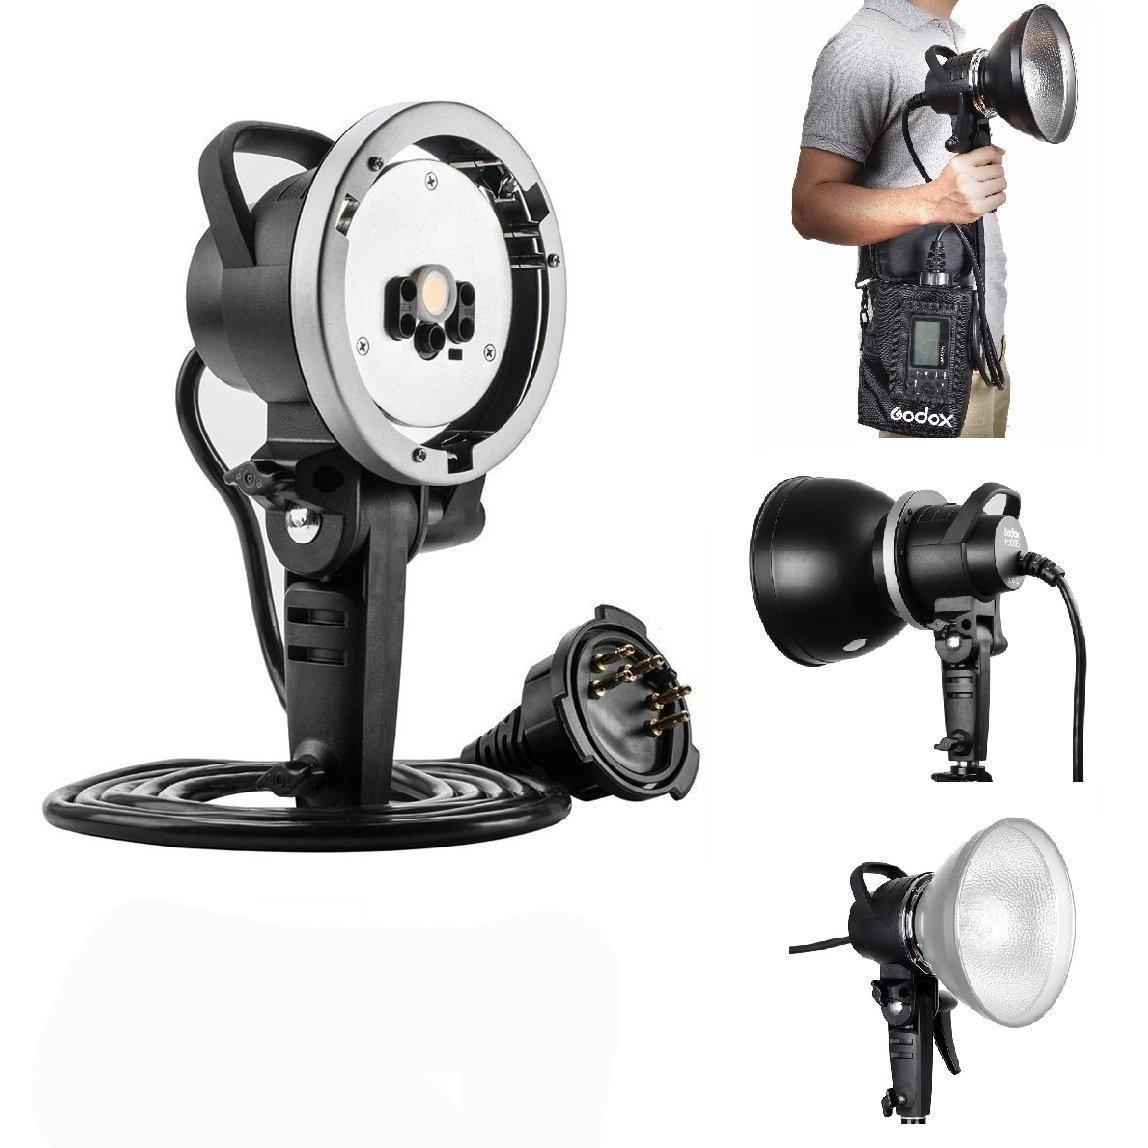 Godox AD600BM AD sync 1 / 8000s 2.4G Wireless Flash Light Speedlite,Godox XPro-C for Canon Cameras,AD-H600B Head,PB-600 Bag,CB-09 Suitcase Carry Bag,LETWING Camera Neck Strap by Godox (Image #6)